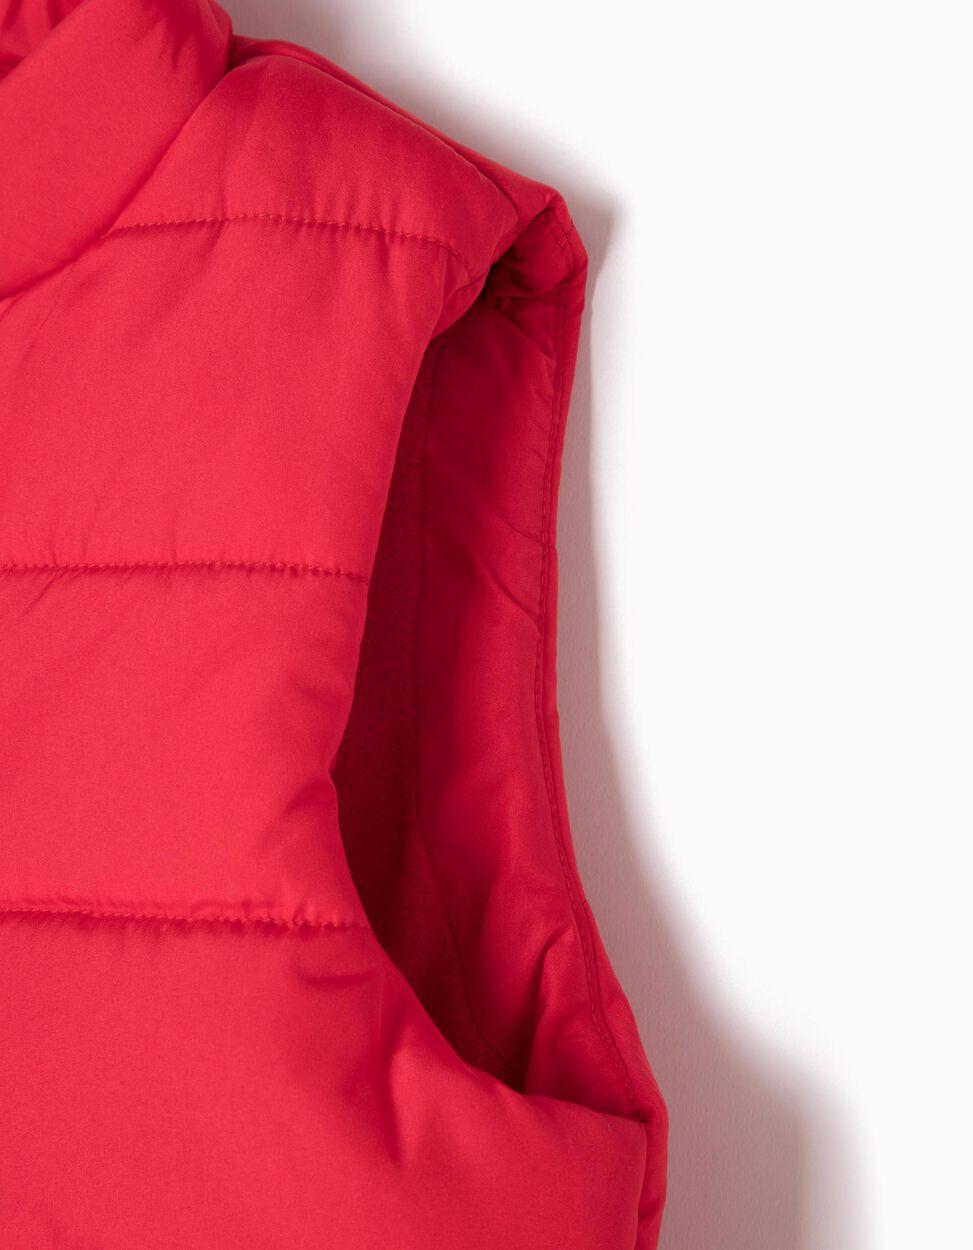 Chaleco Acolchado Rojo